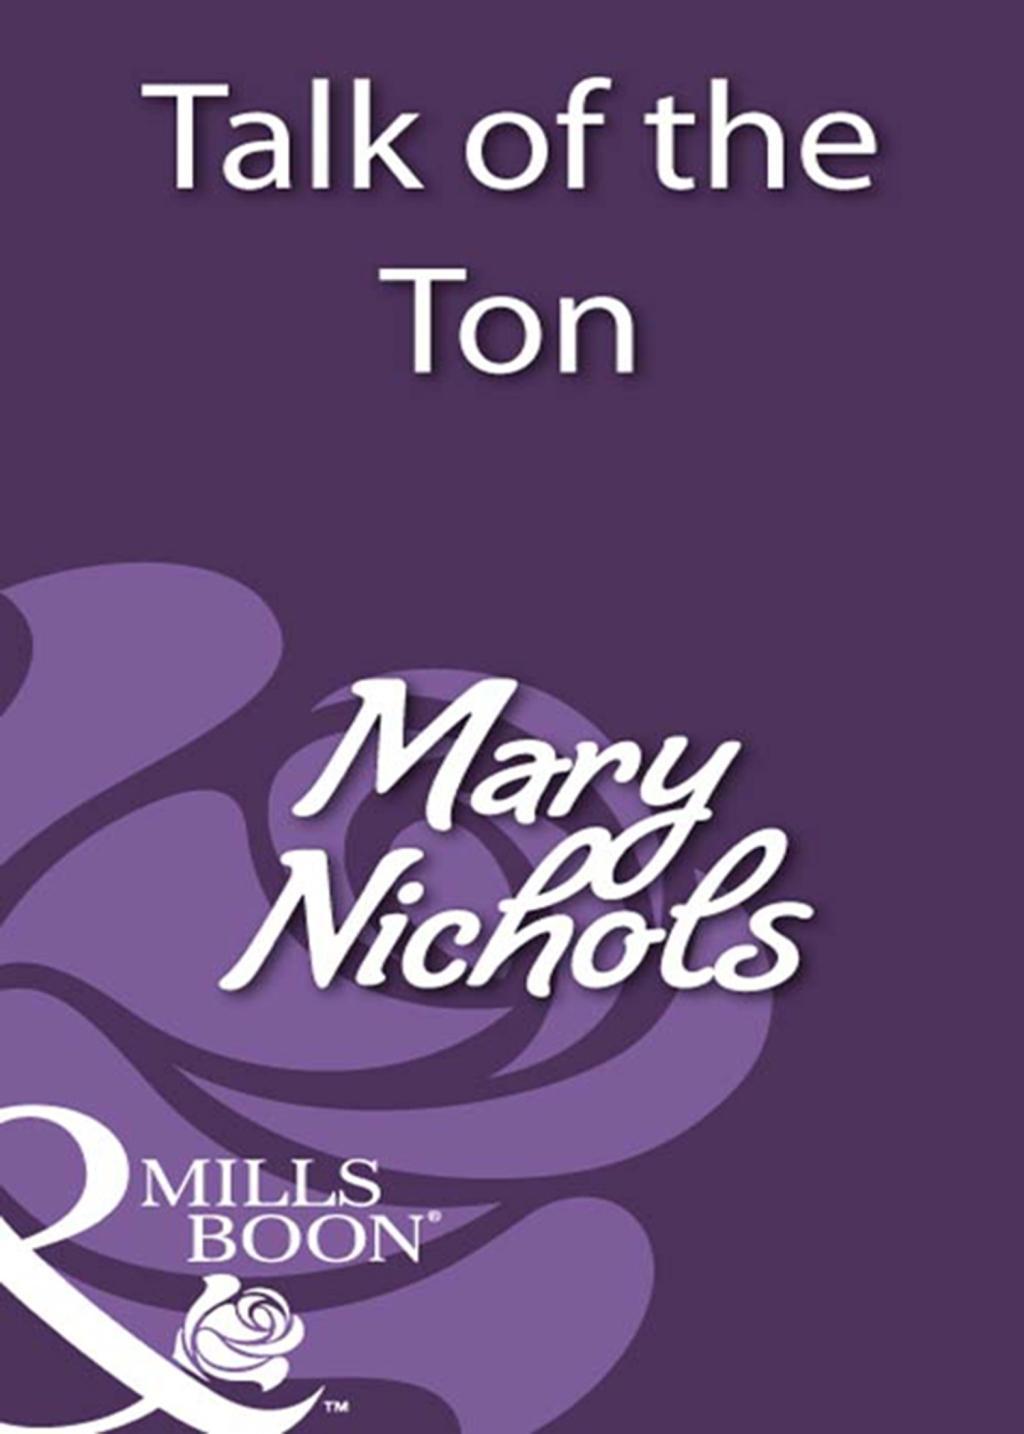 Talk of the Ton (Mills & Boon Historical)